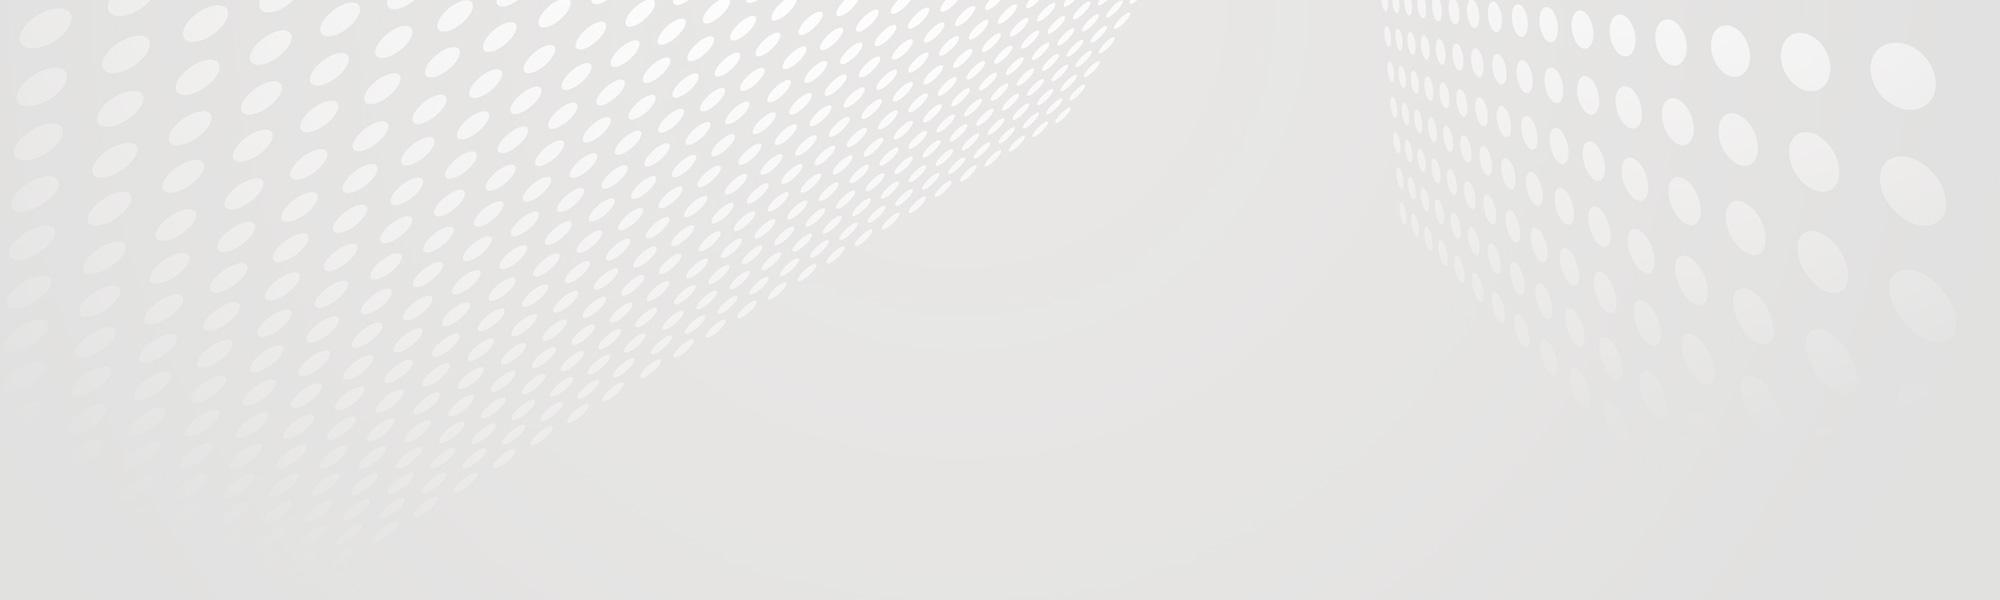 PMZ | Plottermesser Zieser